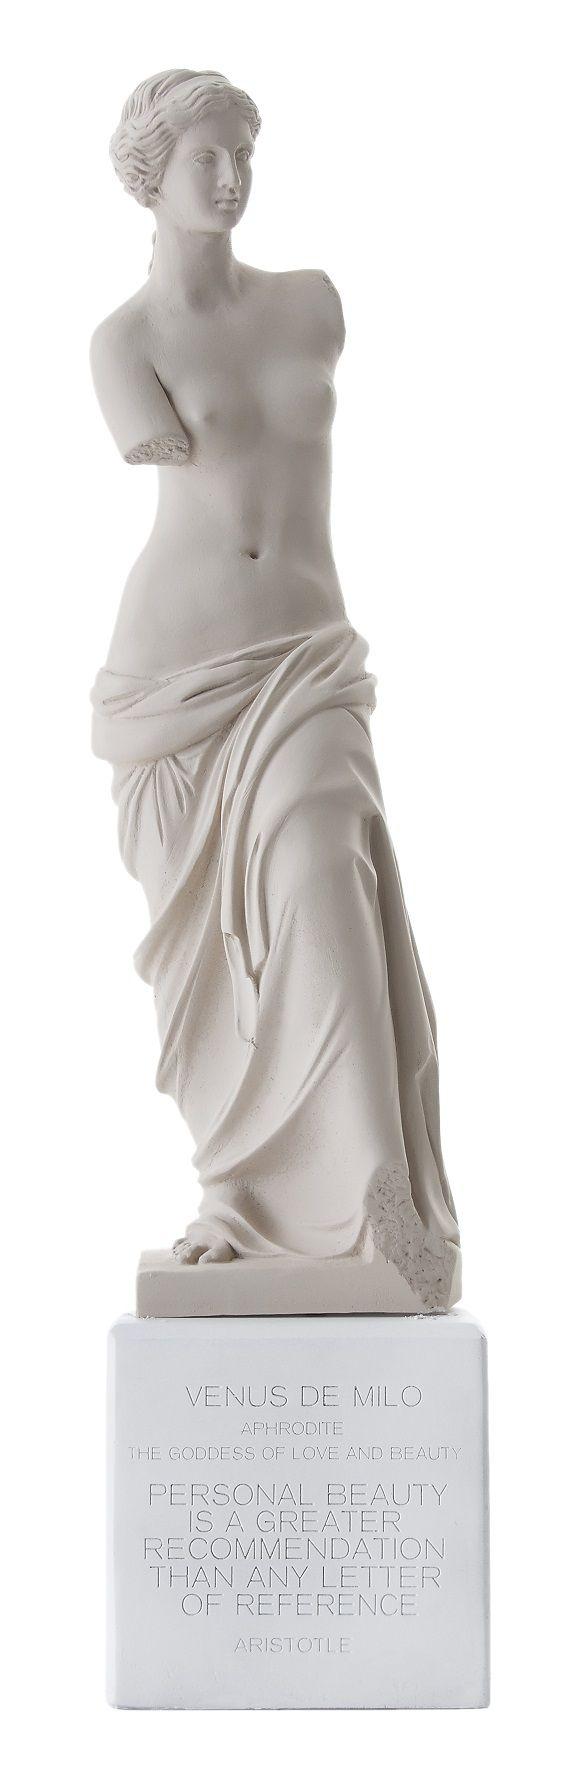 Venus de Milo: Statue. Material 100% Ceramine. Color: Ochre.